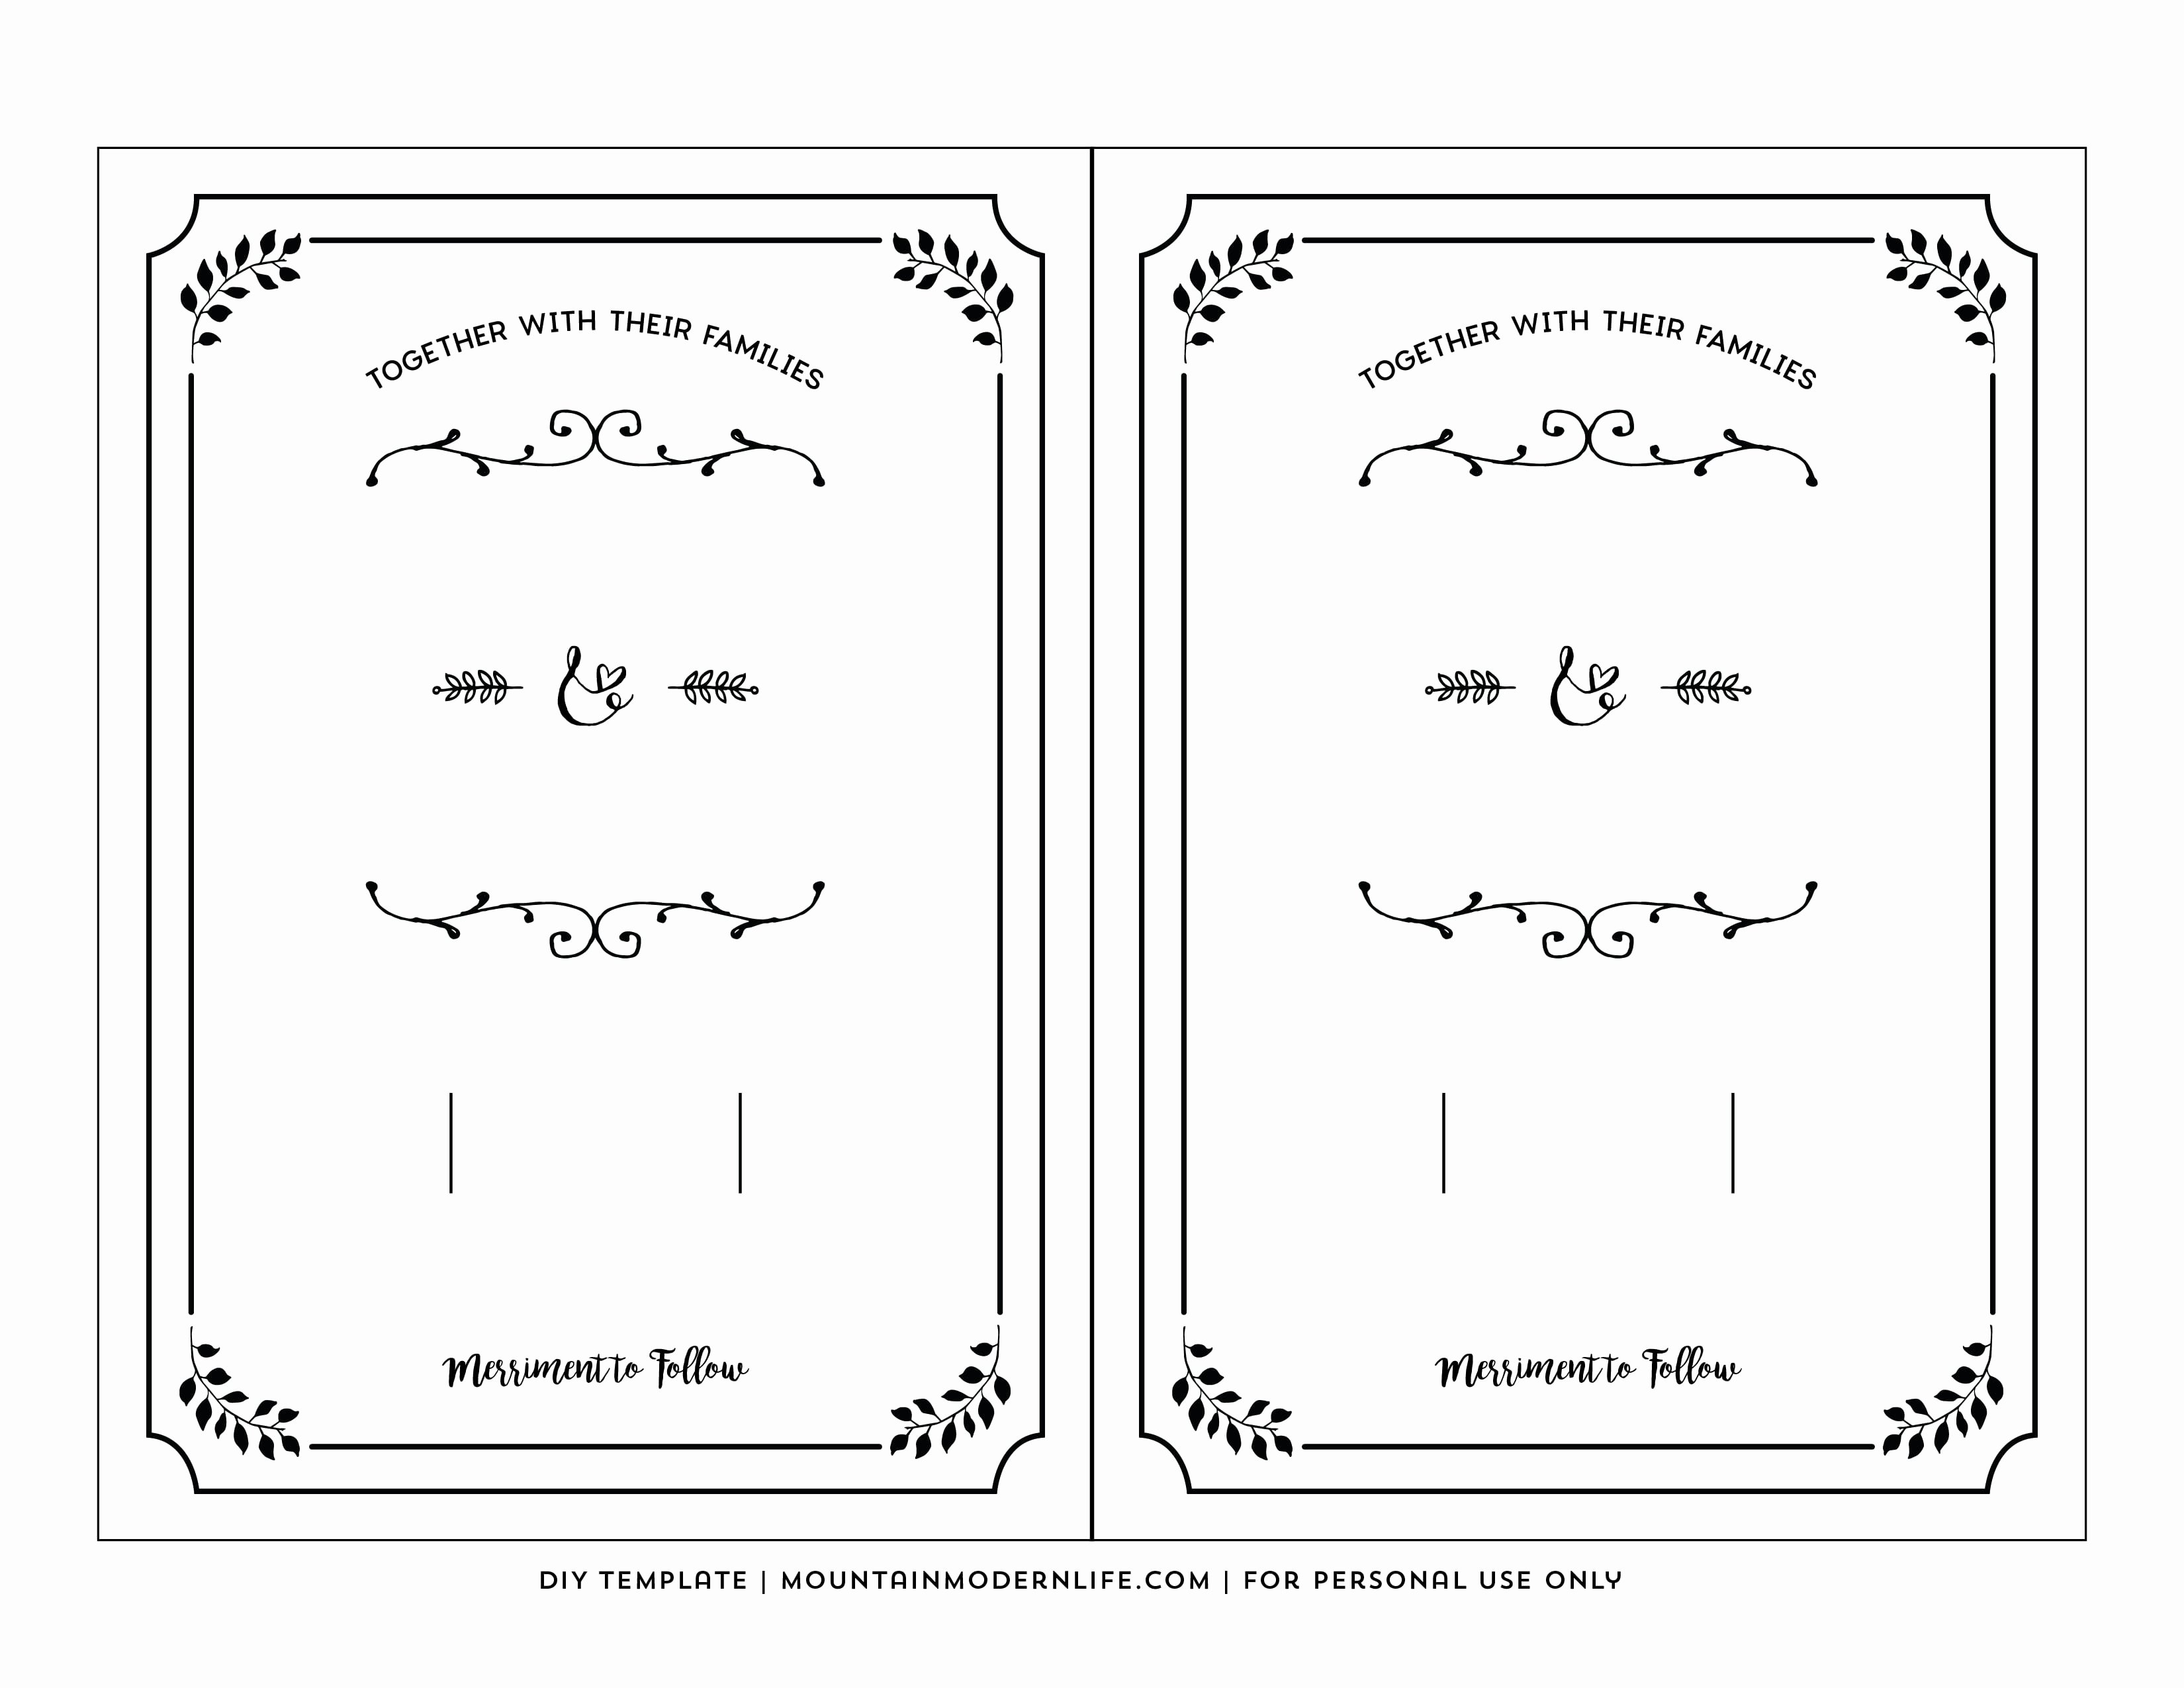 Free Wedding Invitations Printable Lovely Free Printable Blank Wedding Invitation Templates